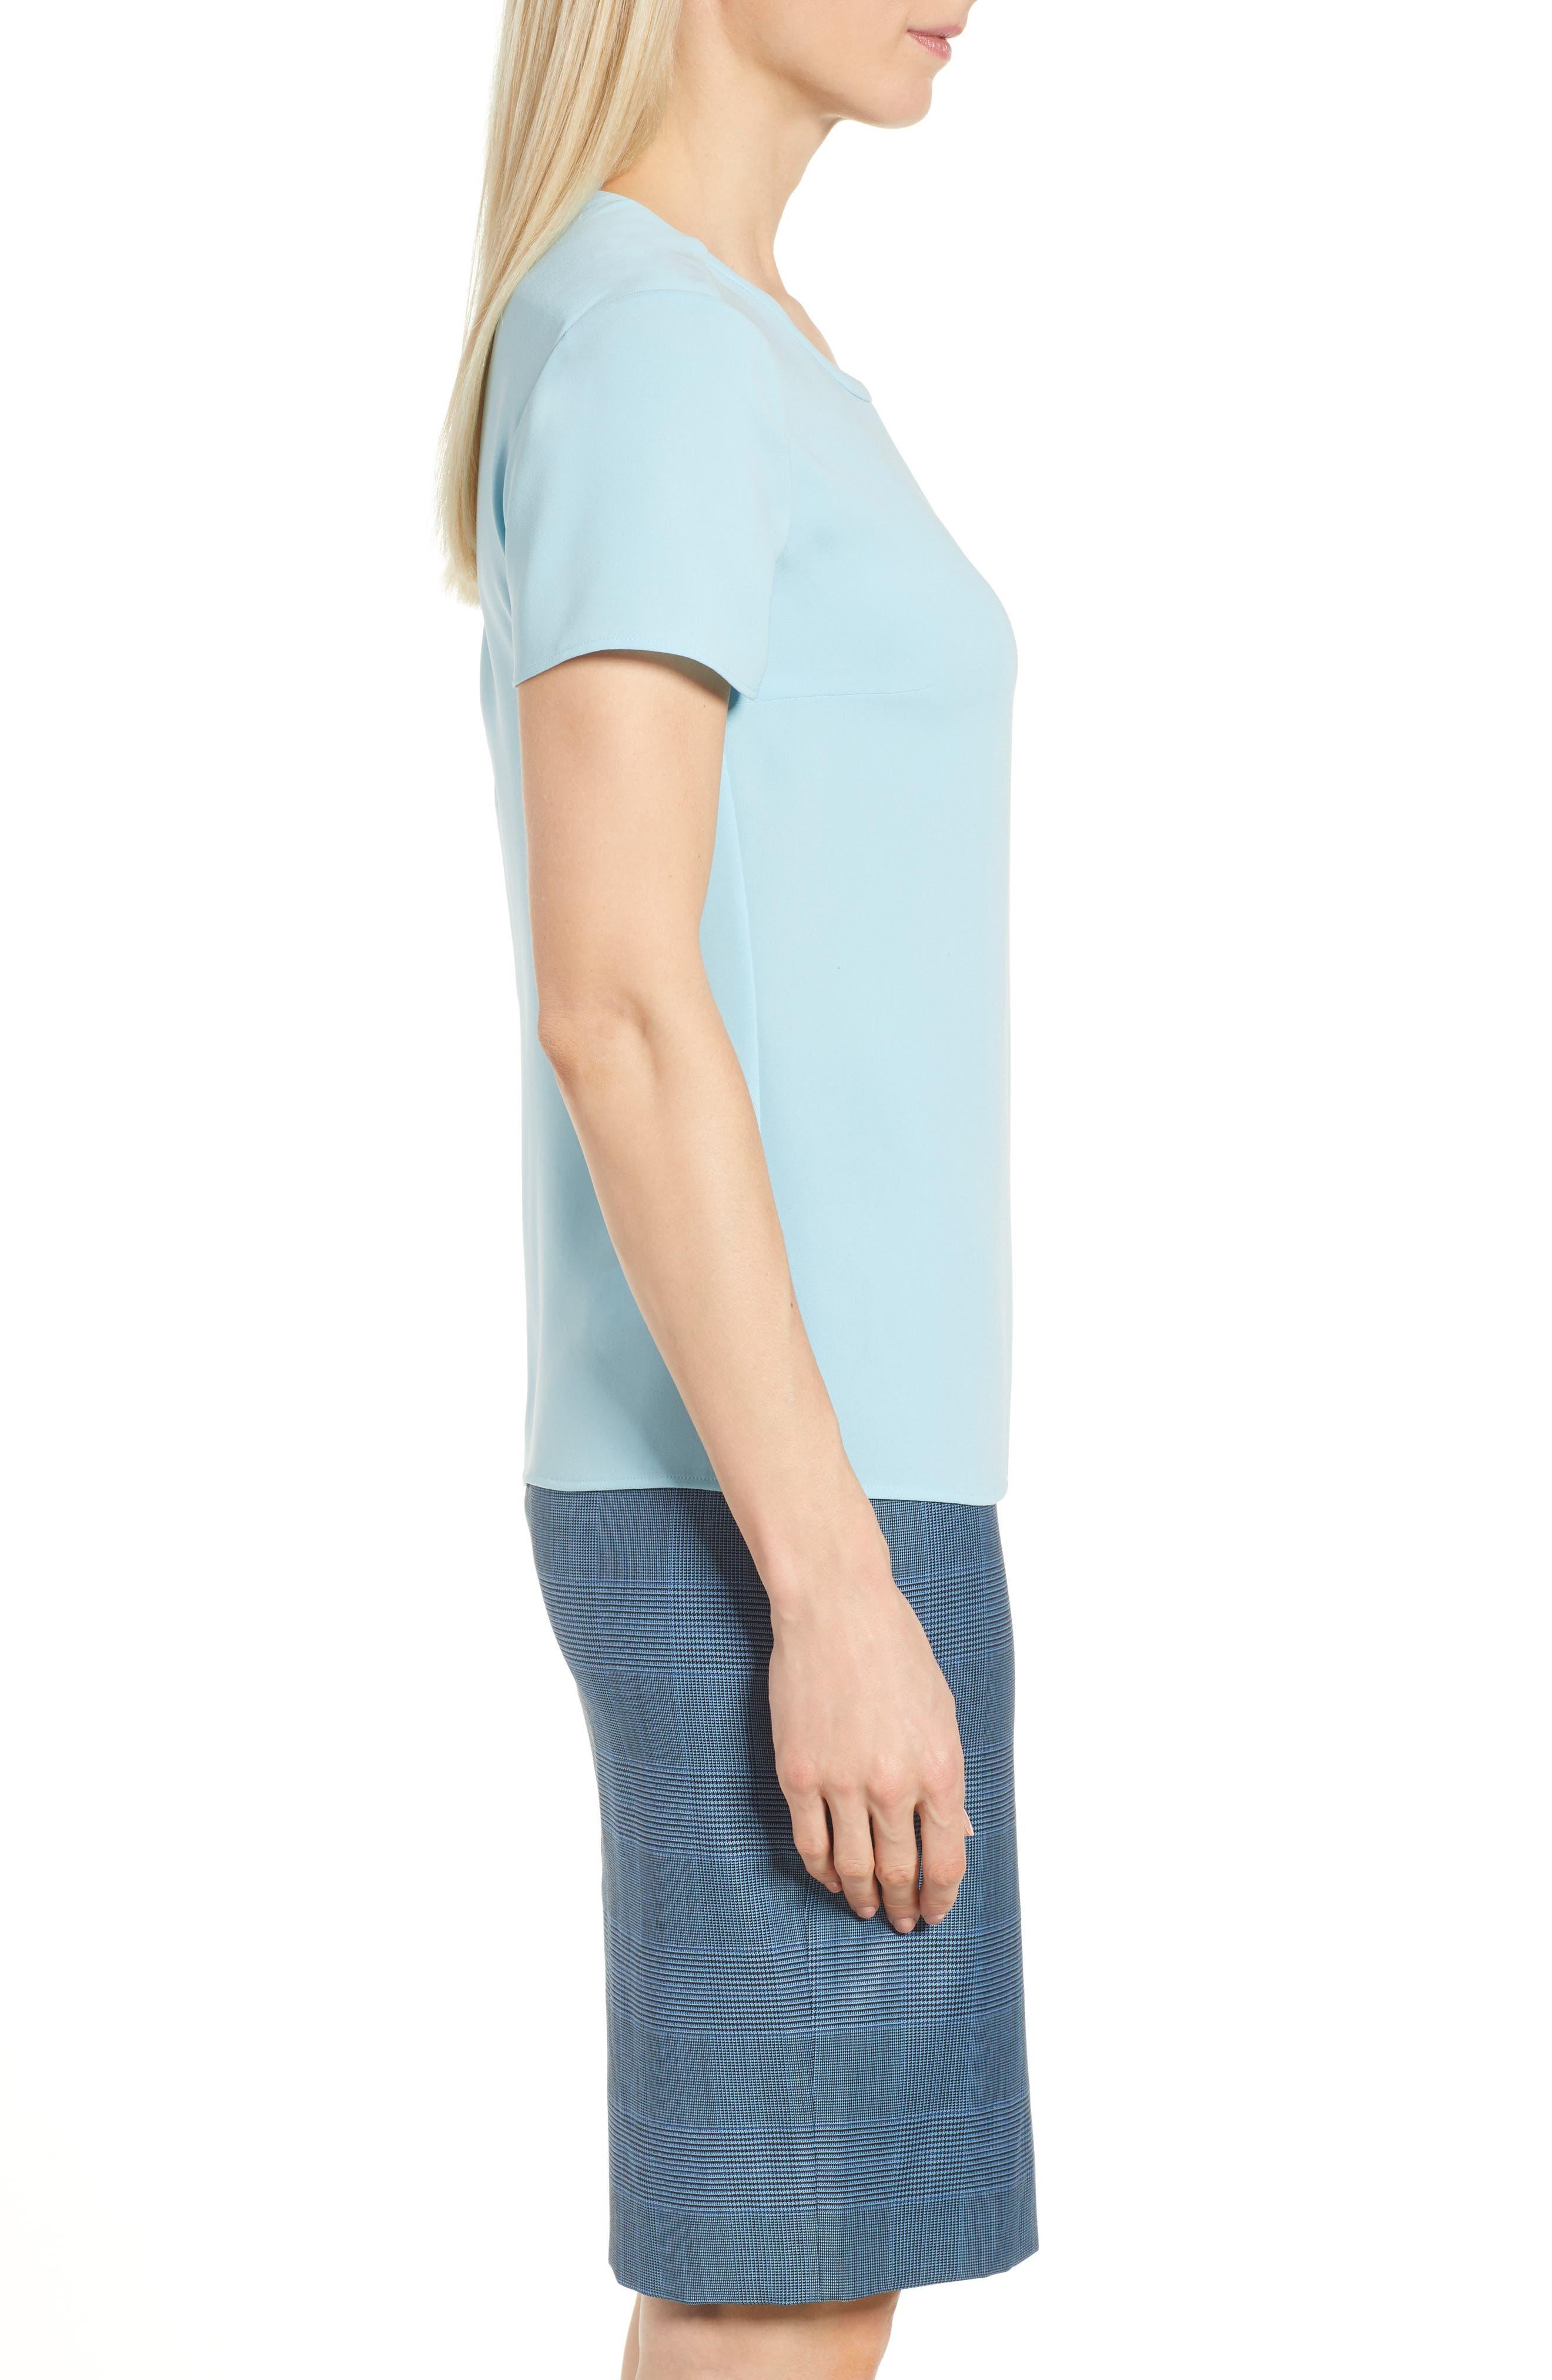 Ilyna Crepe Short Sleeve Top,                             Alternate thumbnail 3, color,                             LAGOON BLUE